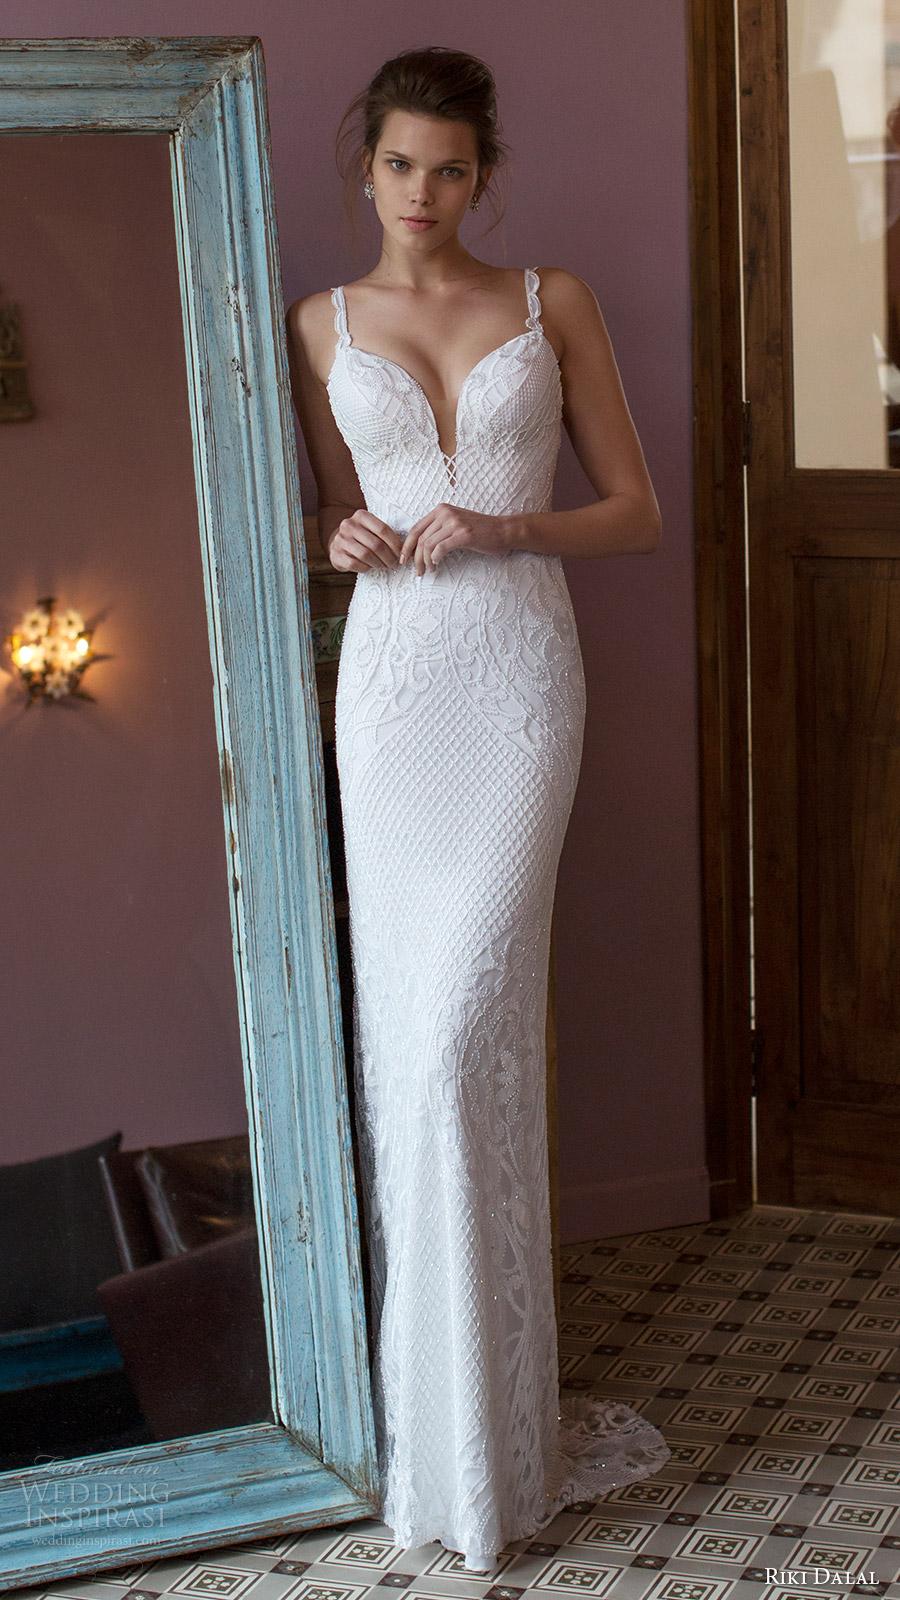 riki dalal bridal 2016 sleeveless deep sweetheart lace strap beaded sheath wedding dress (1812) mv elegant glam